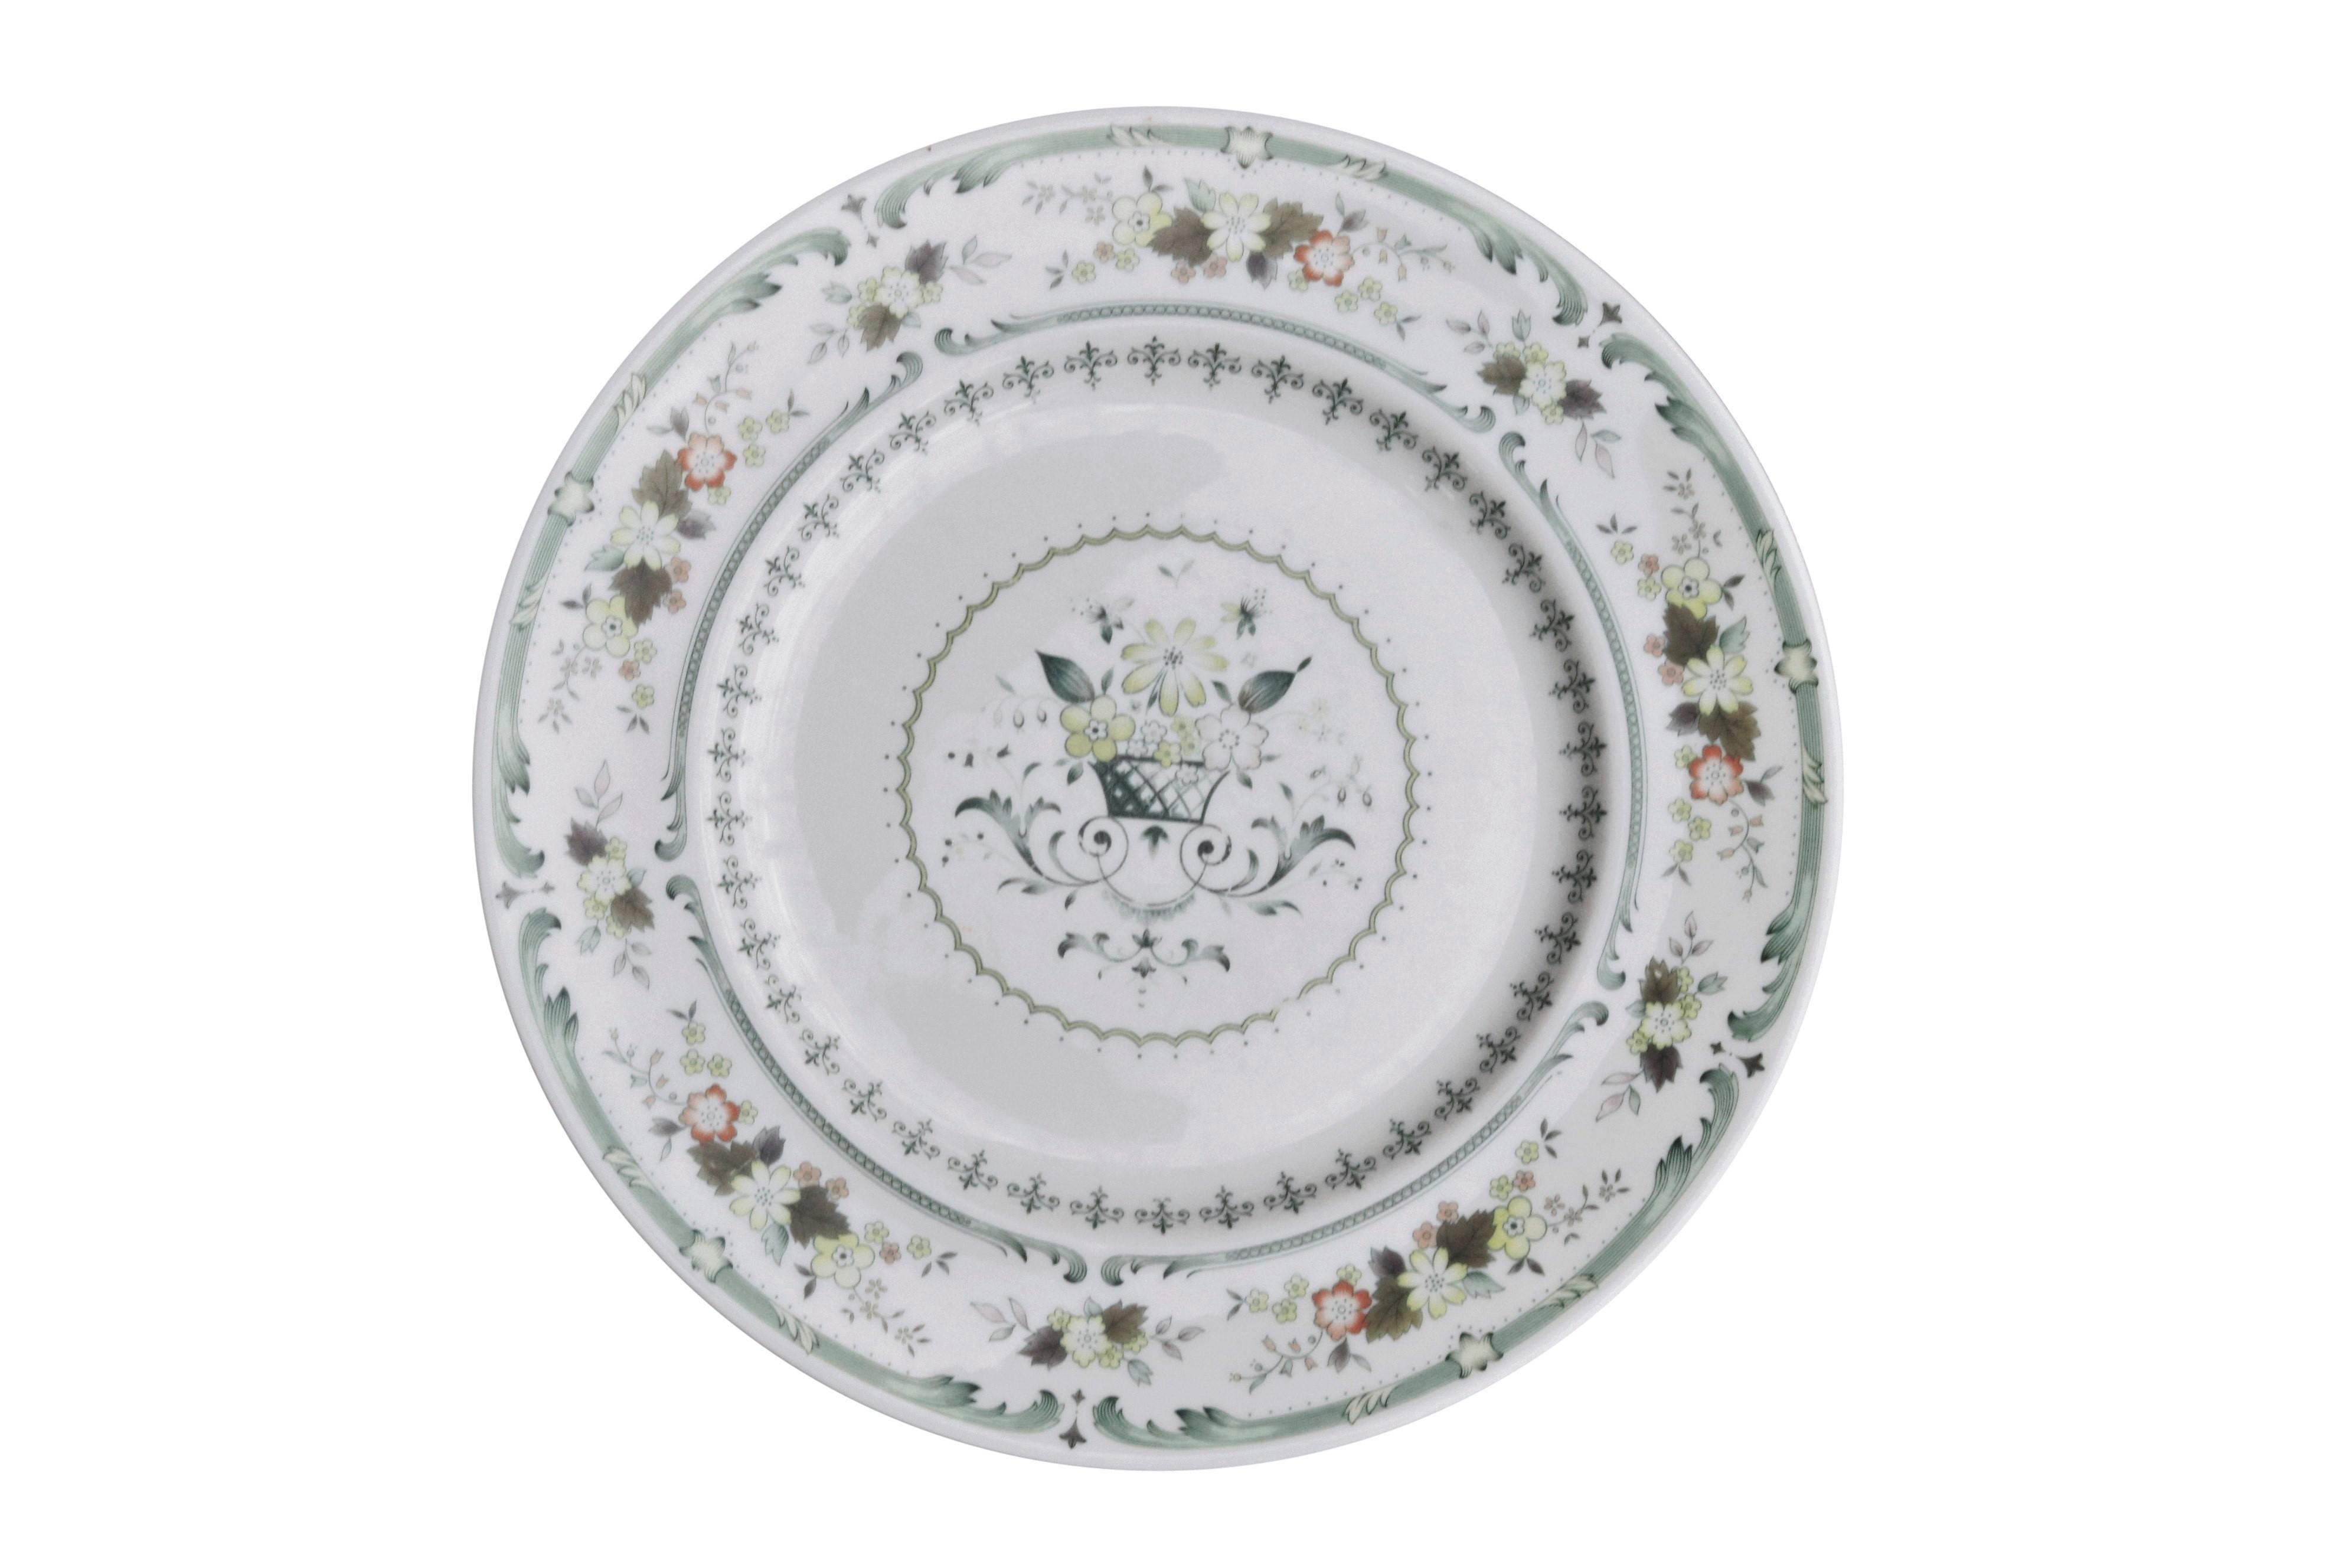 English Fine China Plates by Royal Doulton - Set of 6 - Image 3 of 7  sc 1 st  Chairish & English Fine China Plates by Royal Doulton - Set of 6   Chairish